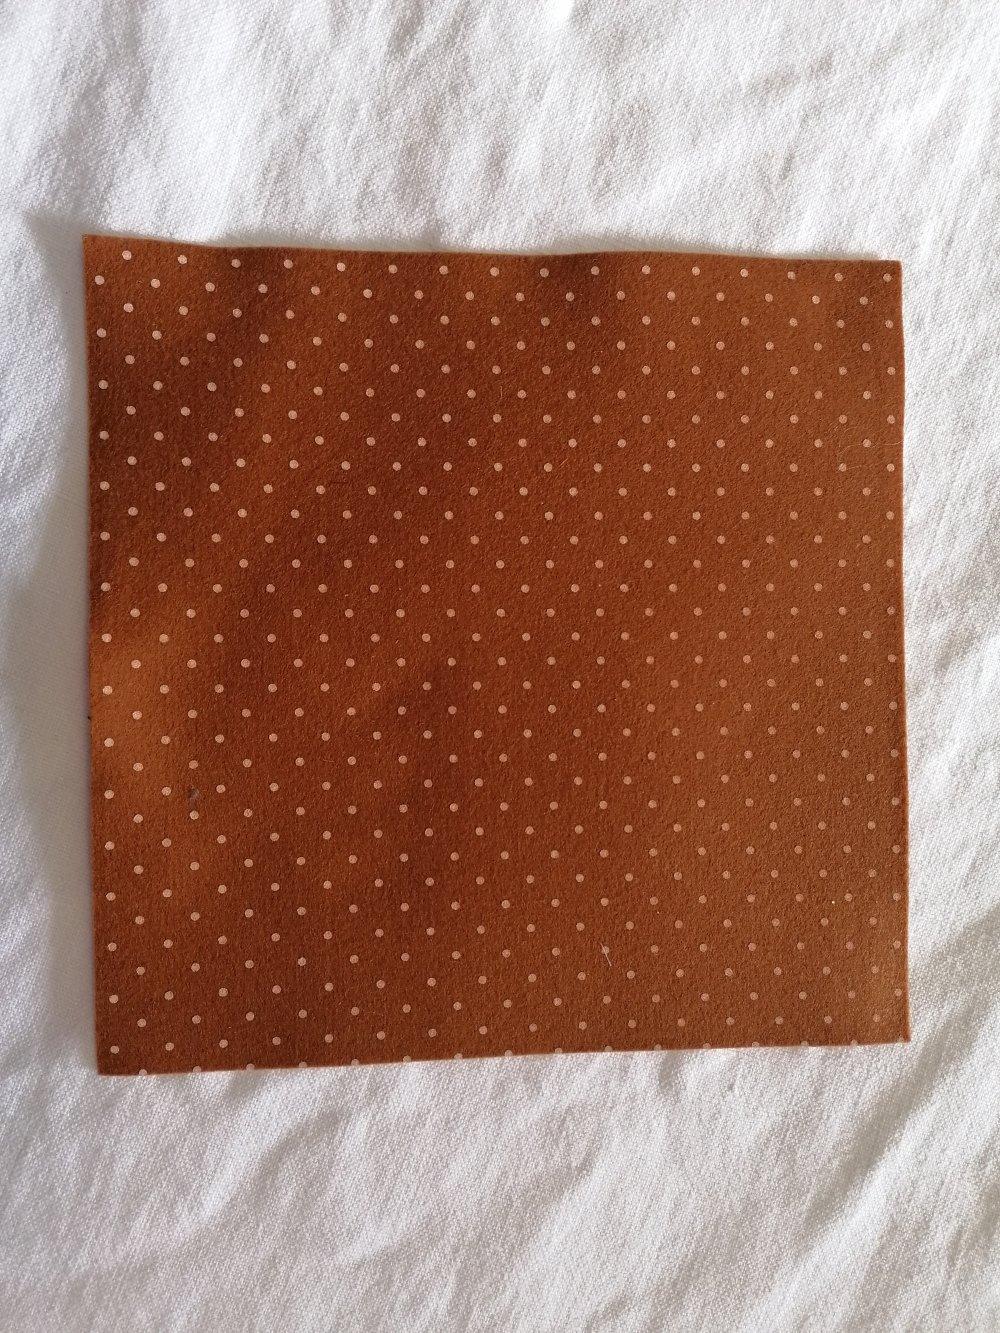 Feutrine 20 x 20 cm 100% polyester loisirs créatifs